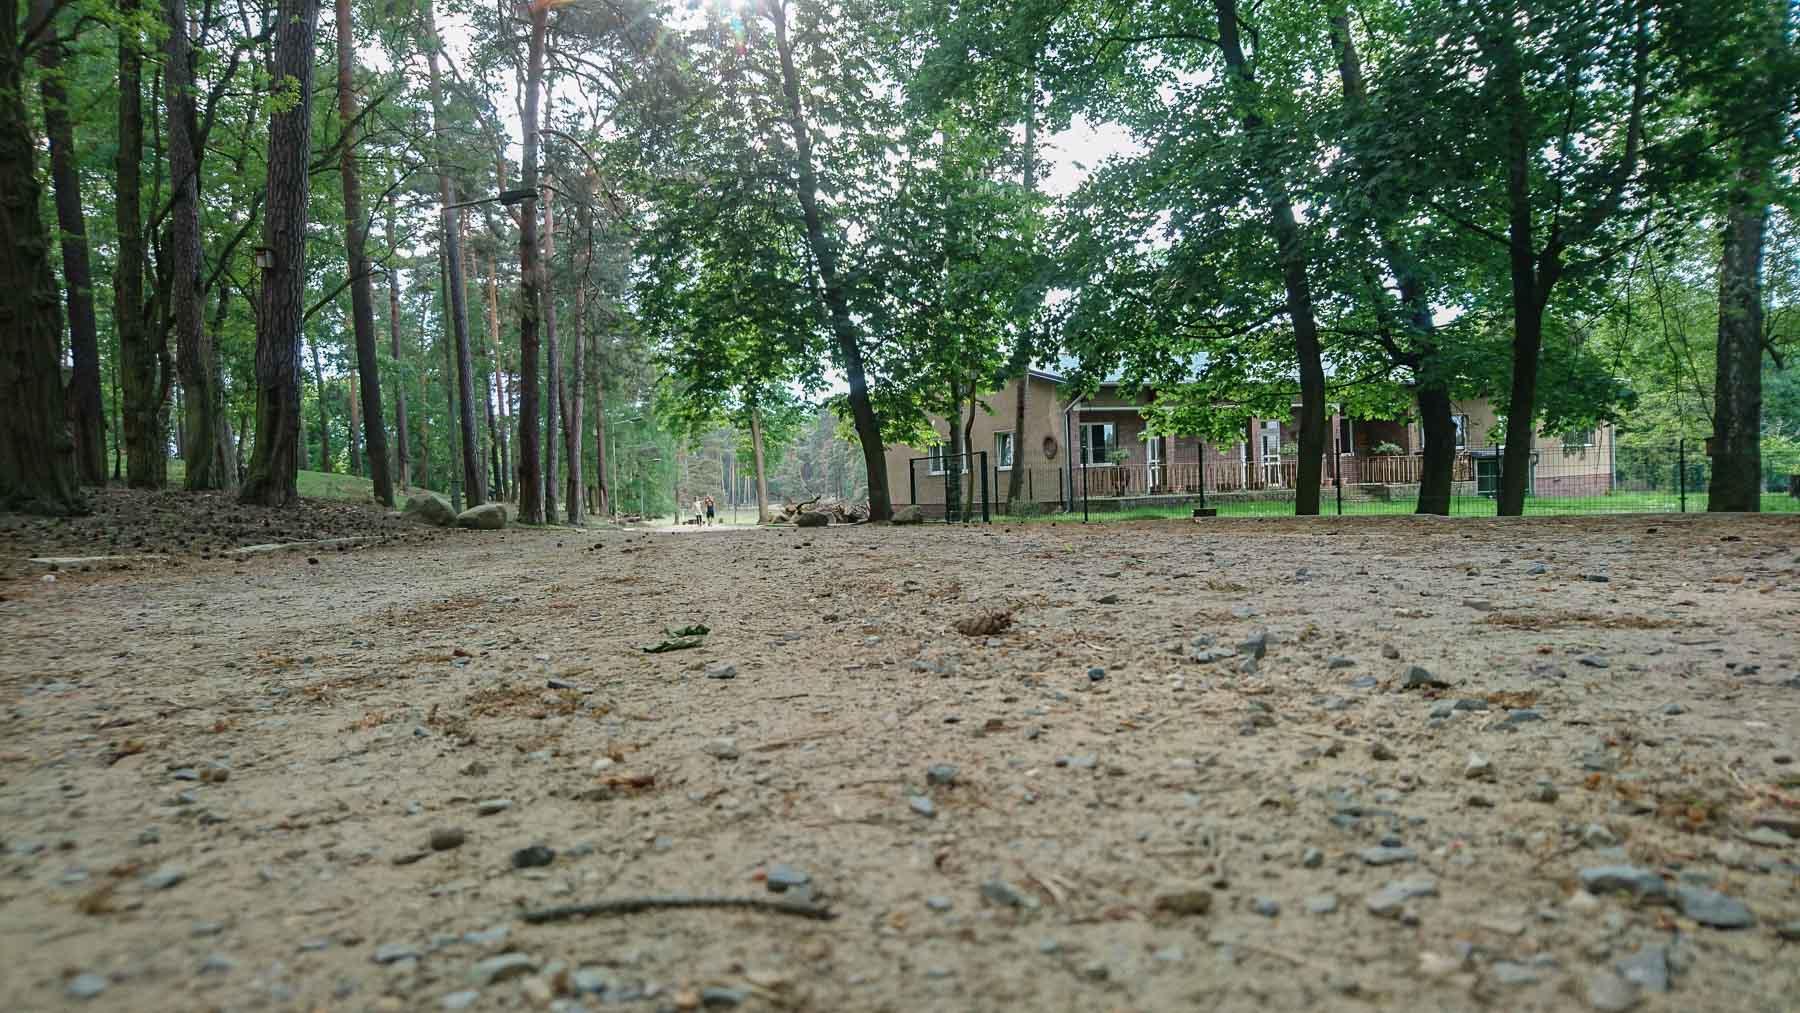 Wildpark Johannismühle Baruth